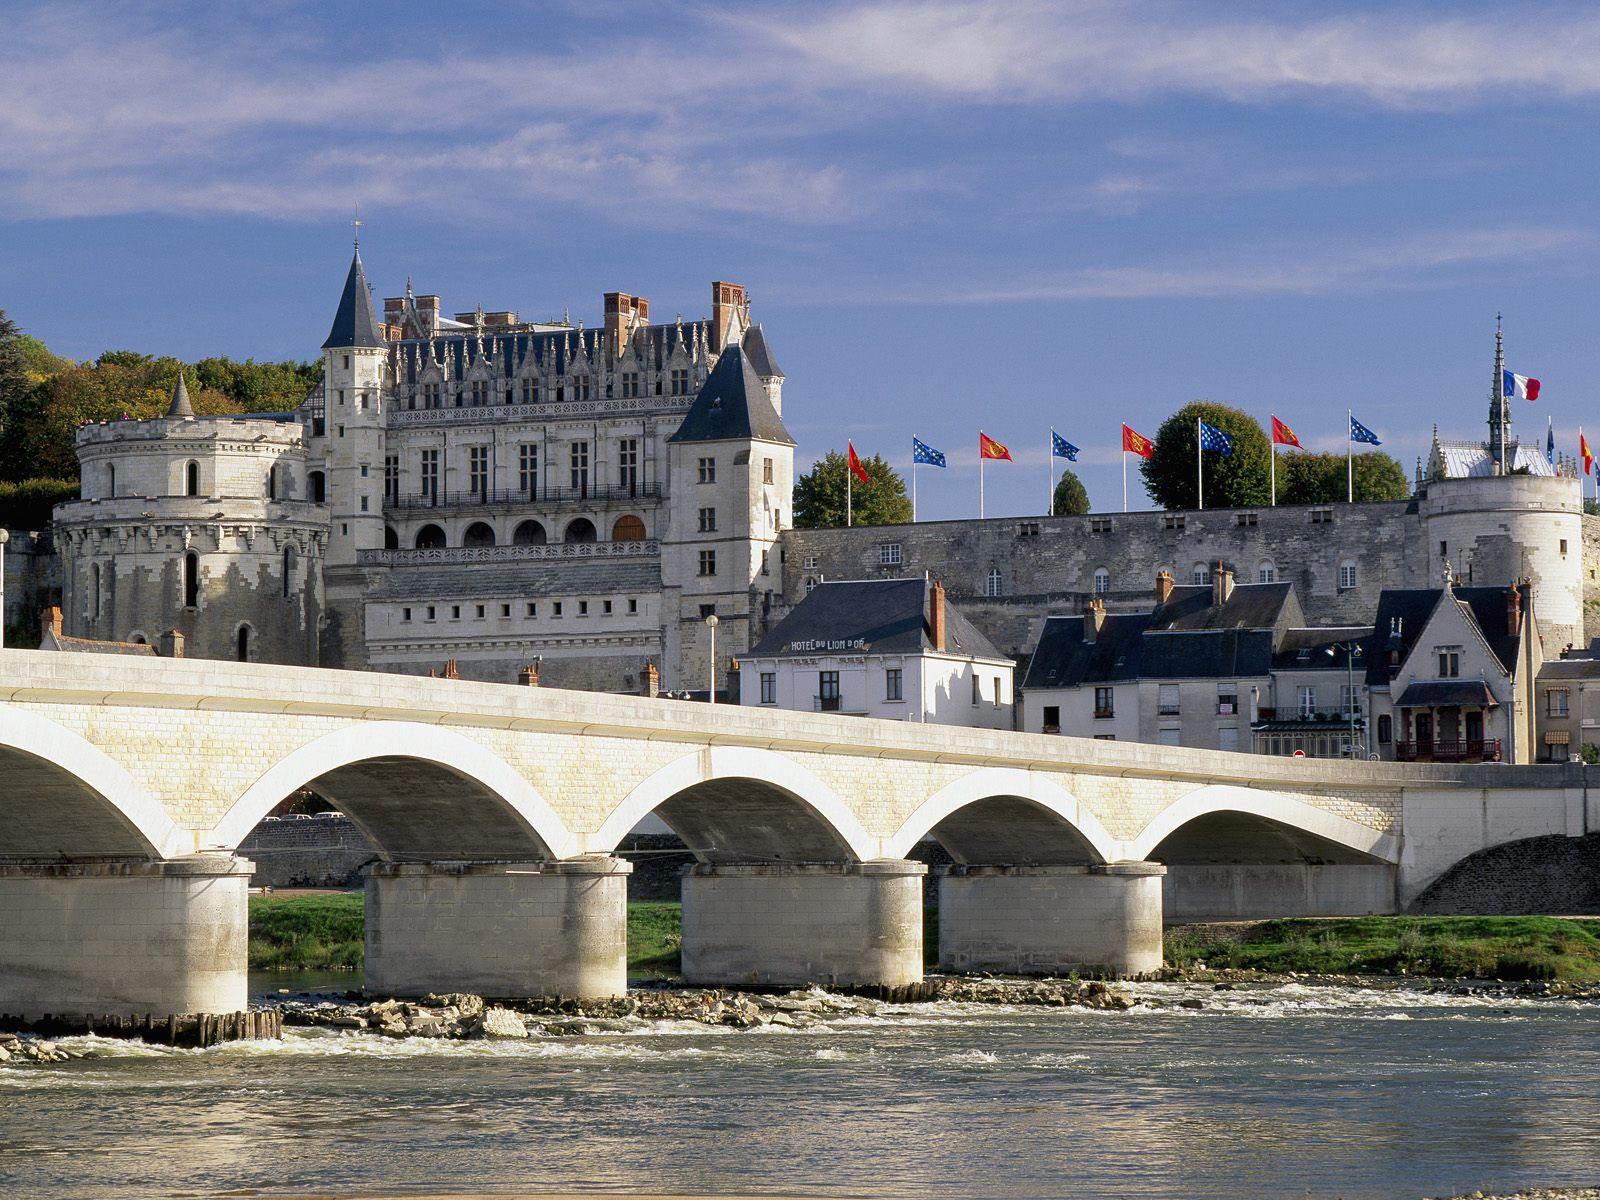 Chateau_d'Amboise_and_Bridge_Loire_Valley_France.jpg